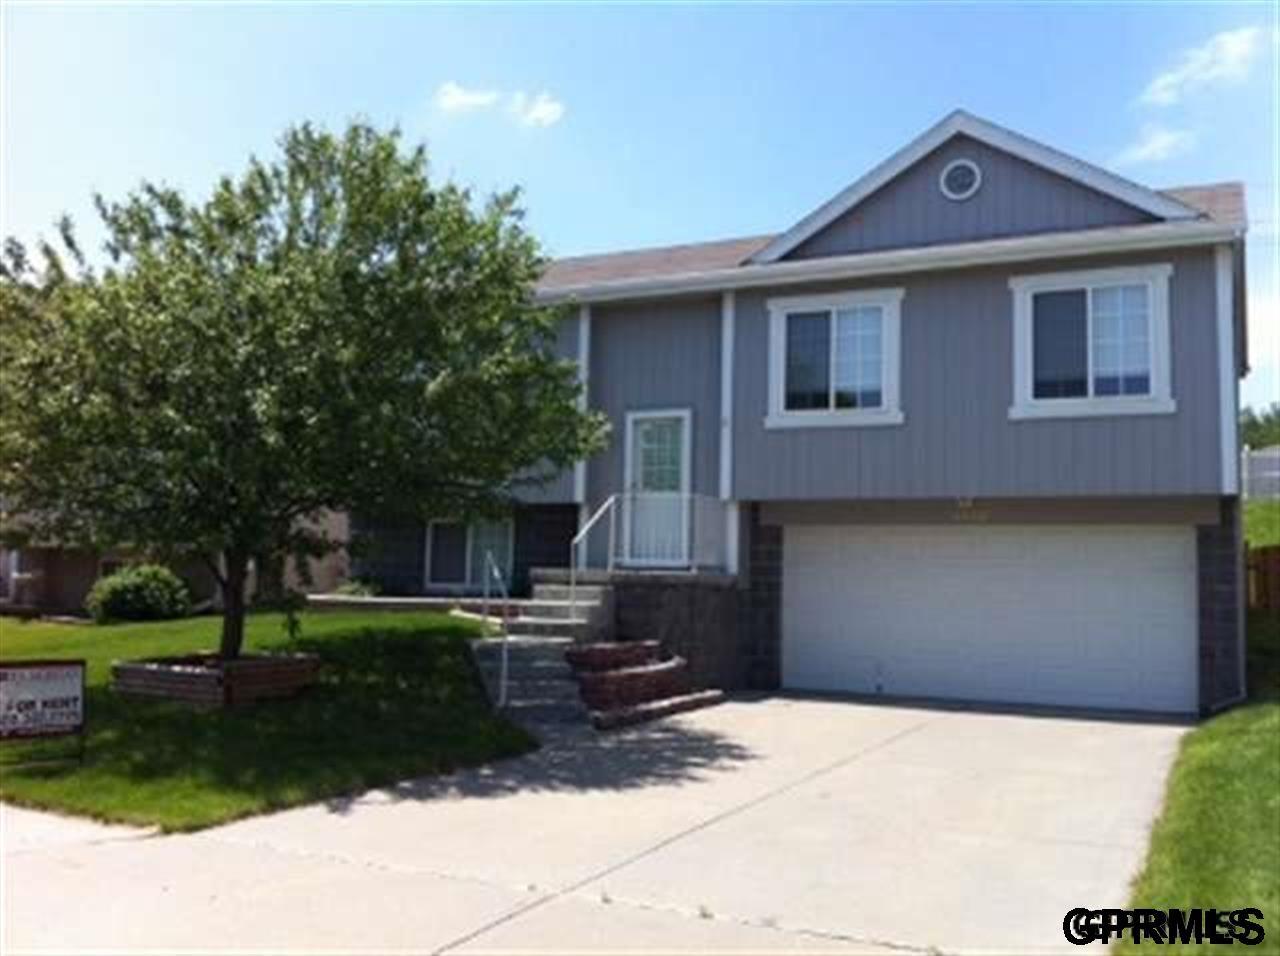 Rental Homes for Rent, ListingId:35807536, location: 5402 S 191st Omaha 68135